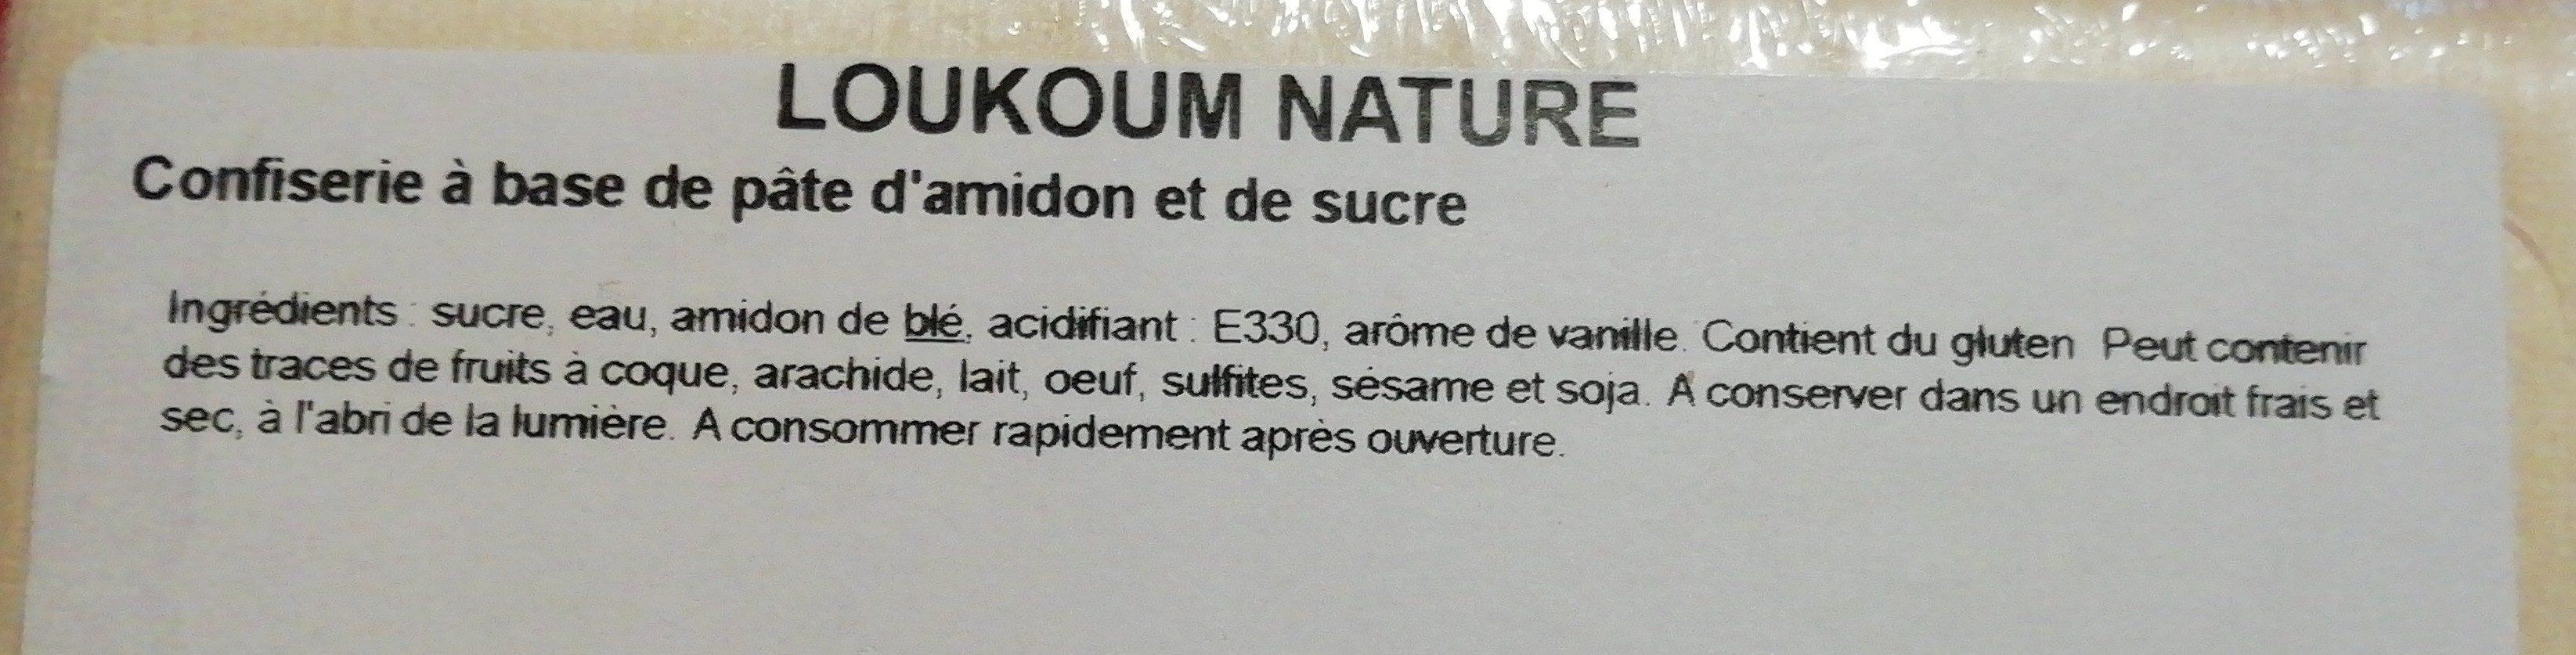 Loukoum nature - Ingredients - fr